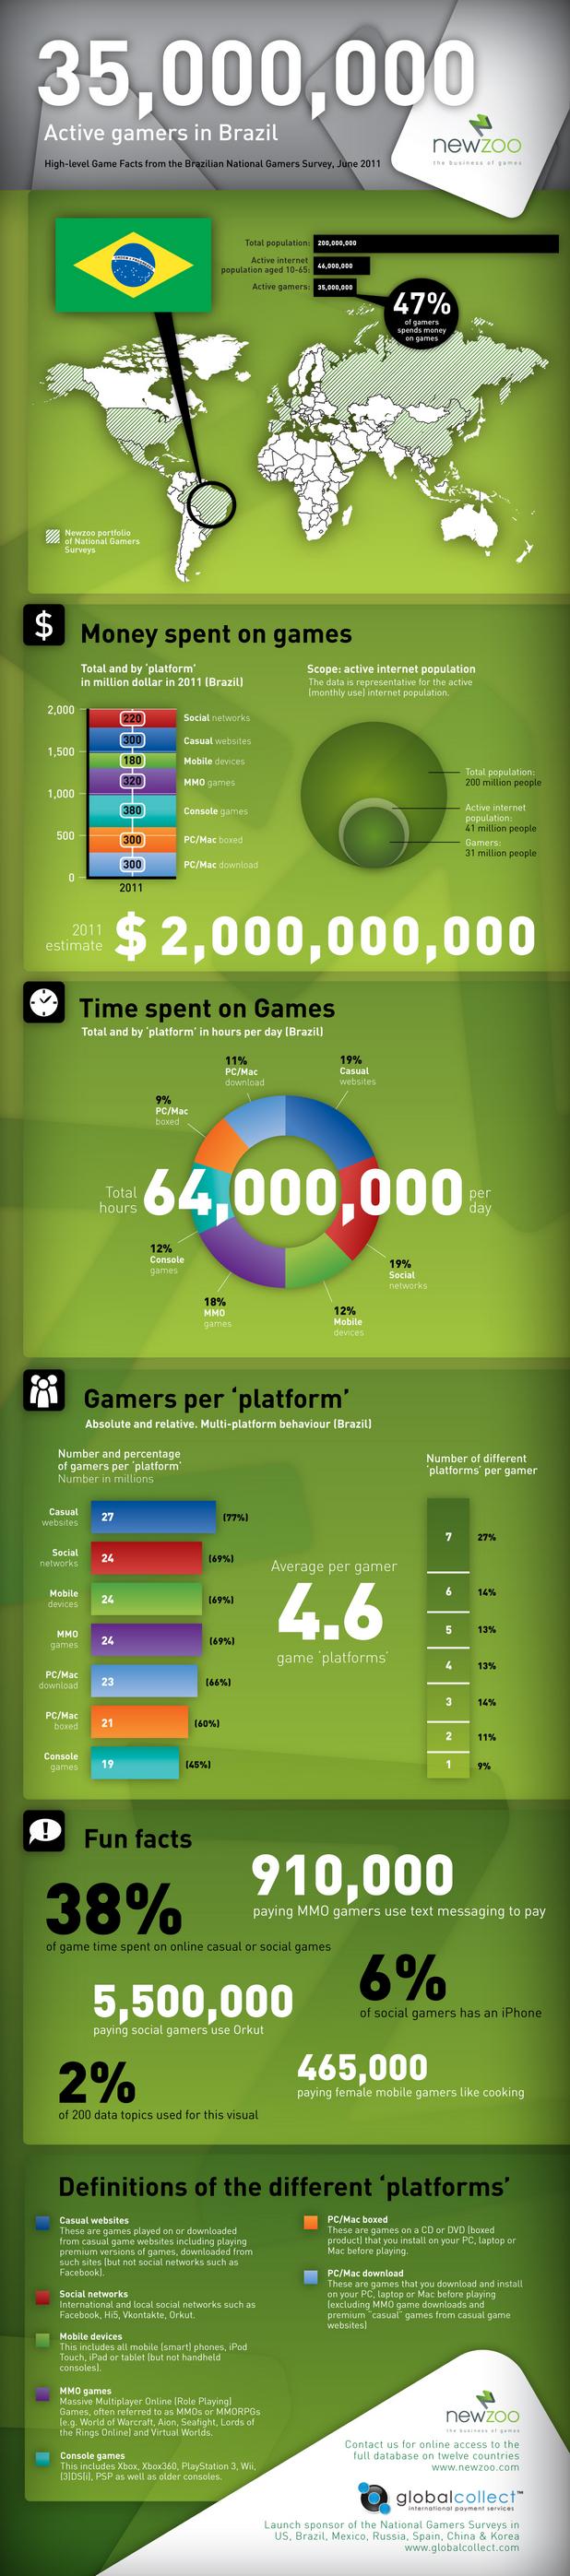 Industria de jogos no Brasil